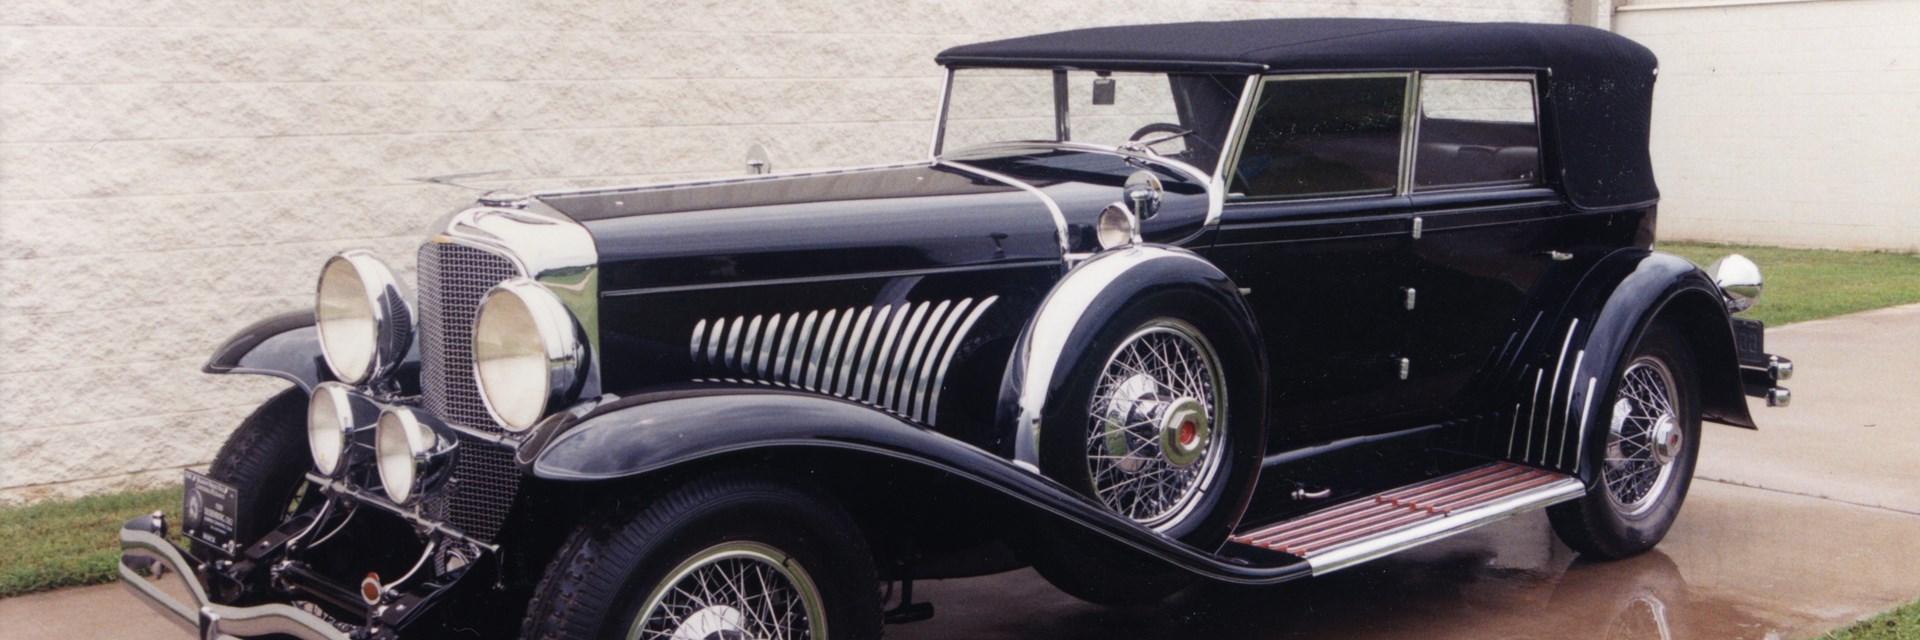 Vintage Motor Cars At Meadow Brook Hall